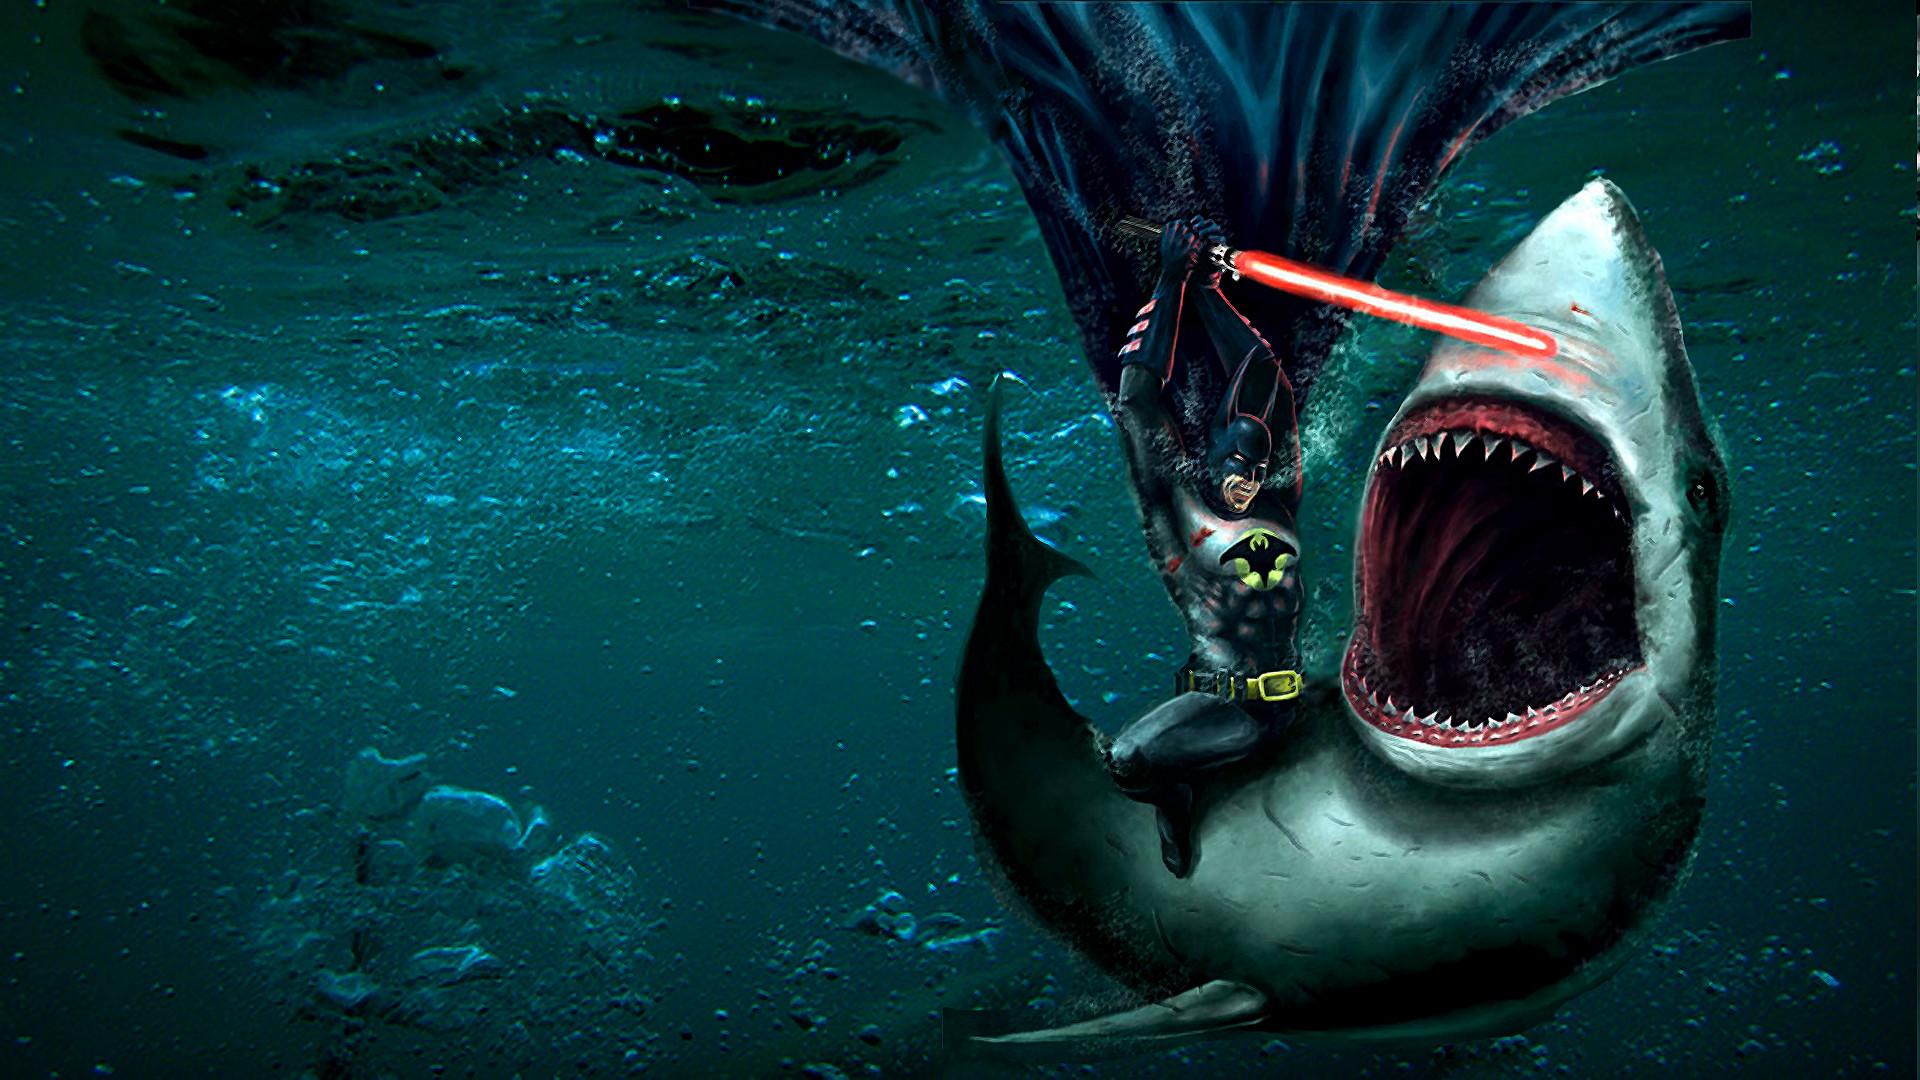 lightsabers Sharks Underwater HD Wallpaper   Unique HD Wallpapers .